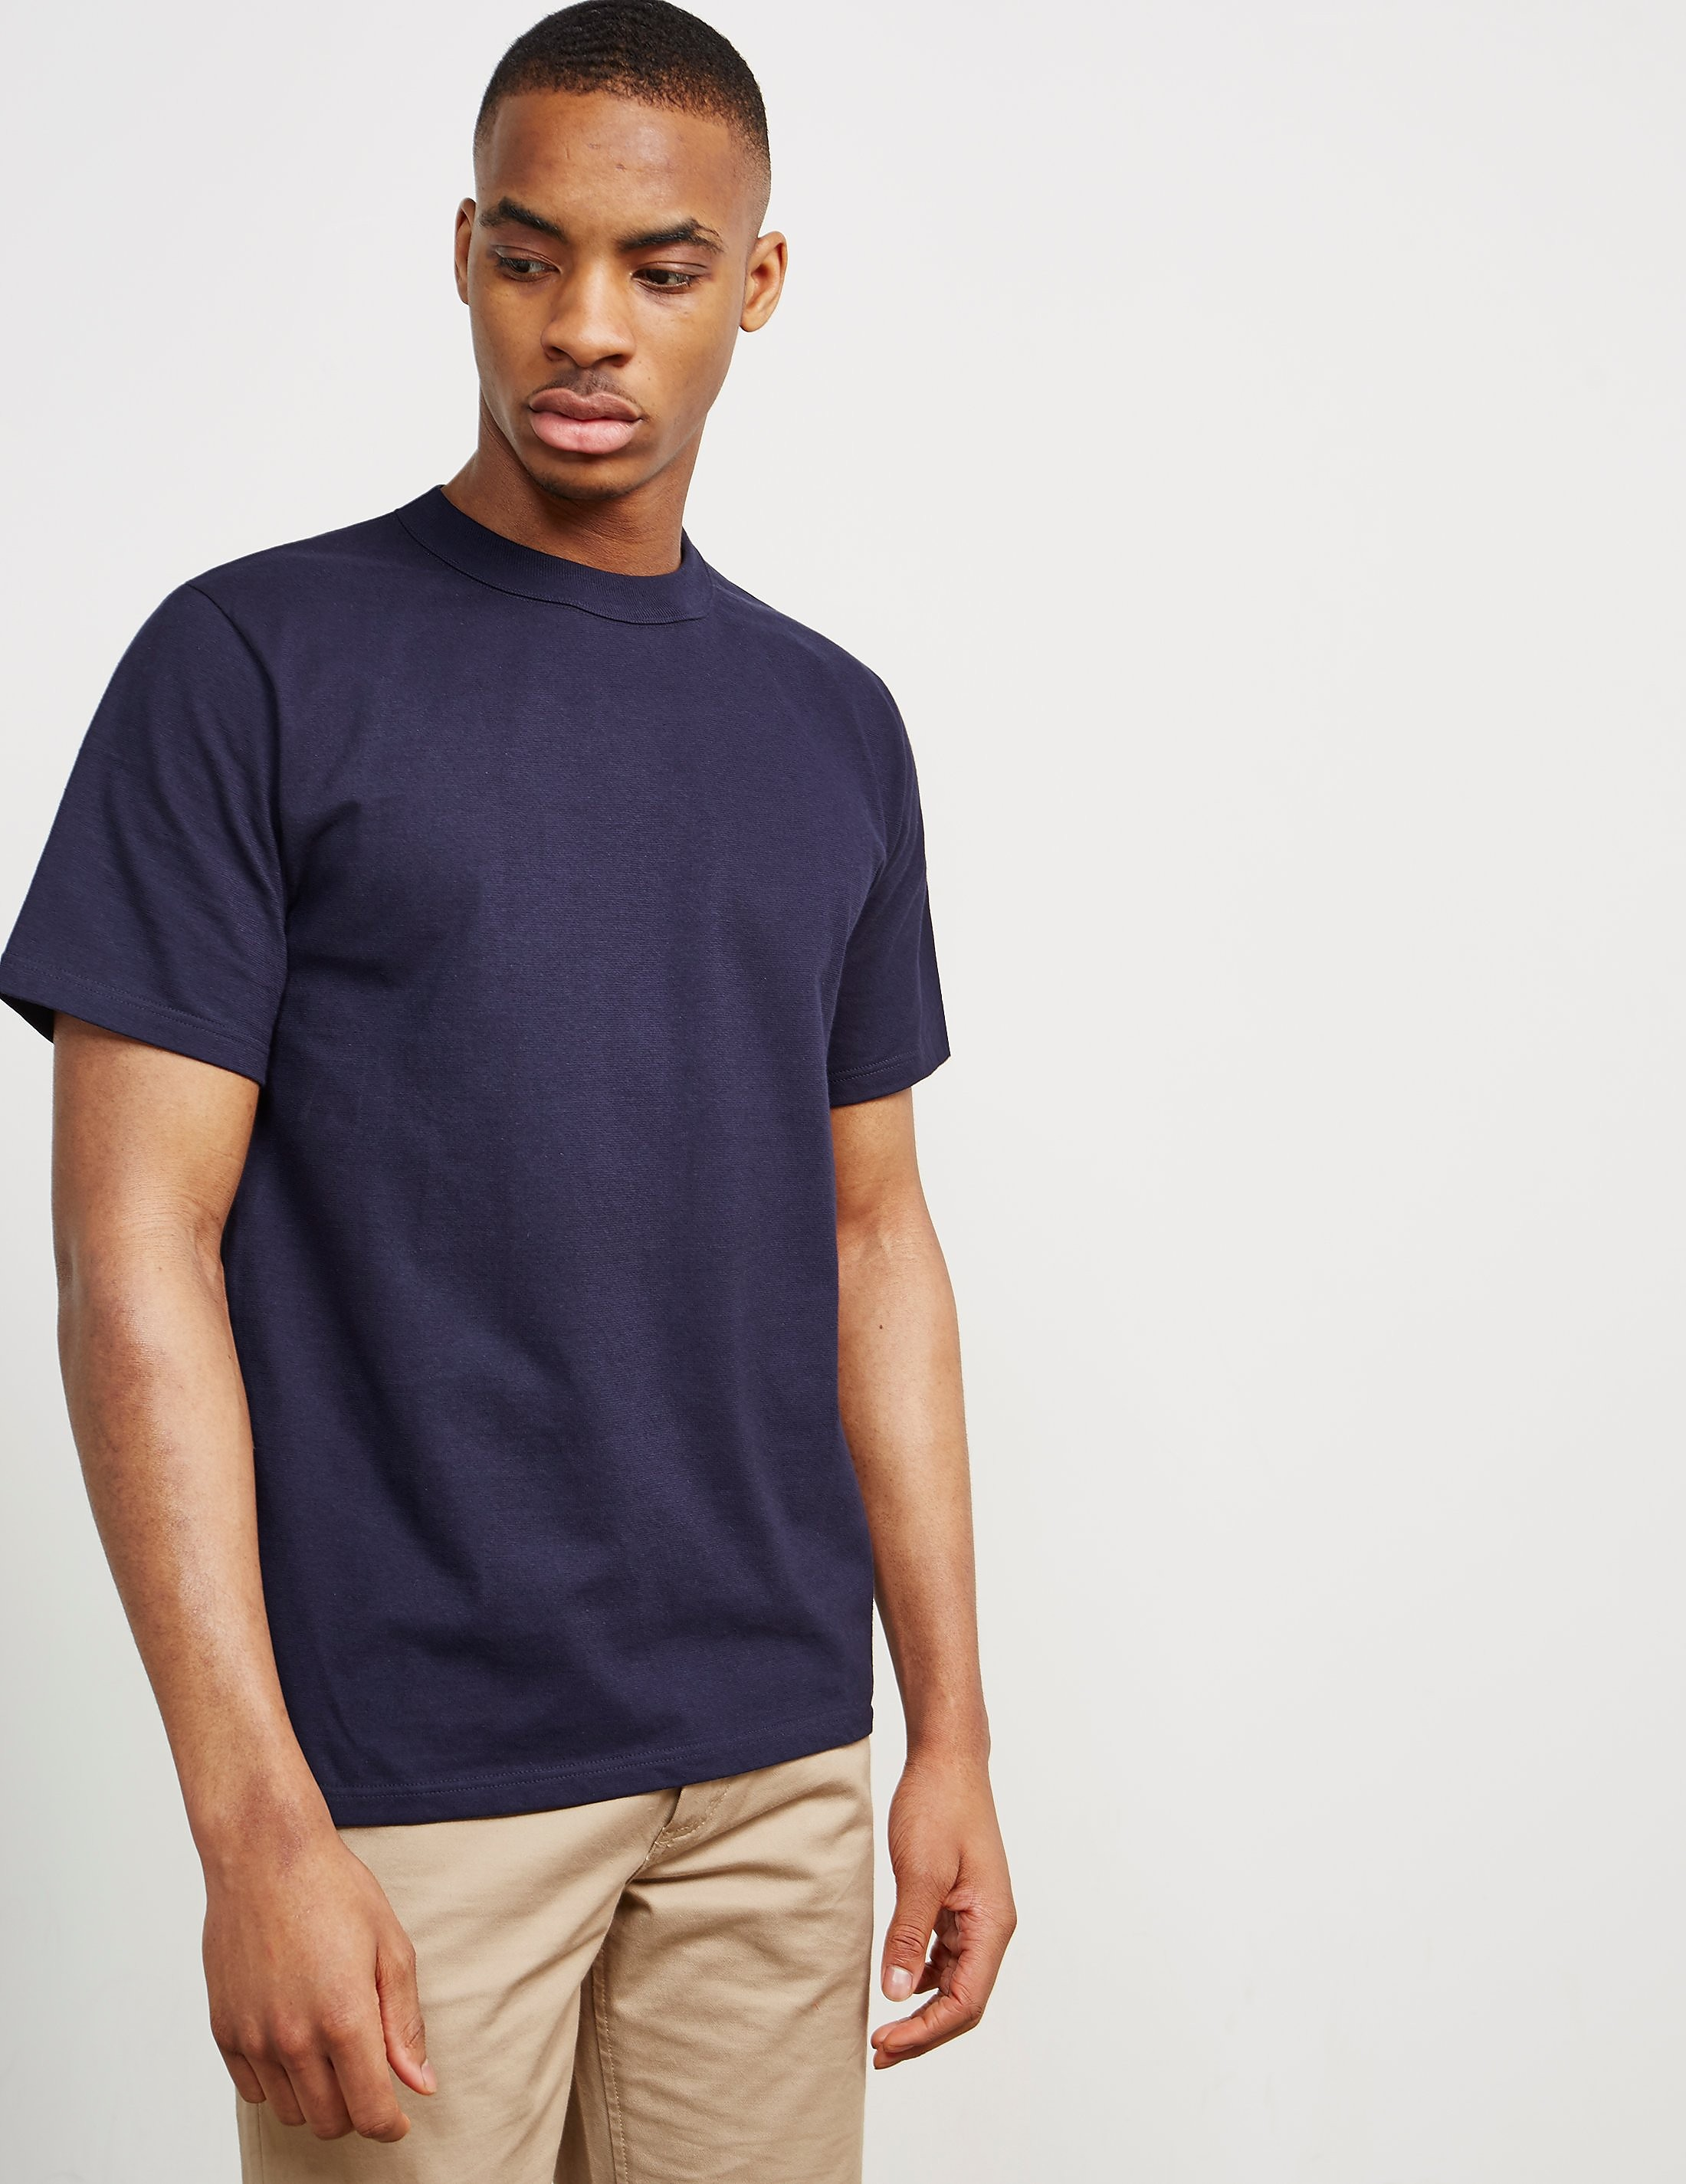 Armor Lux Callac Short Sleeve T-Shirt